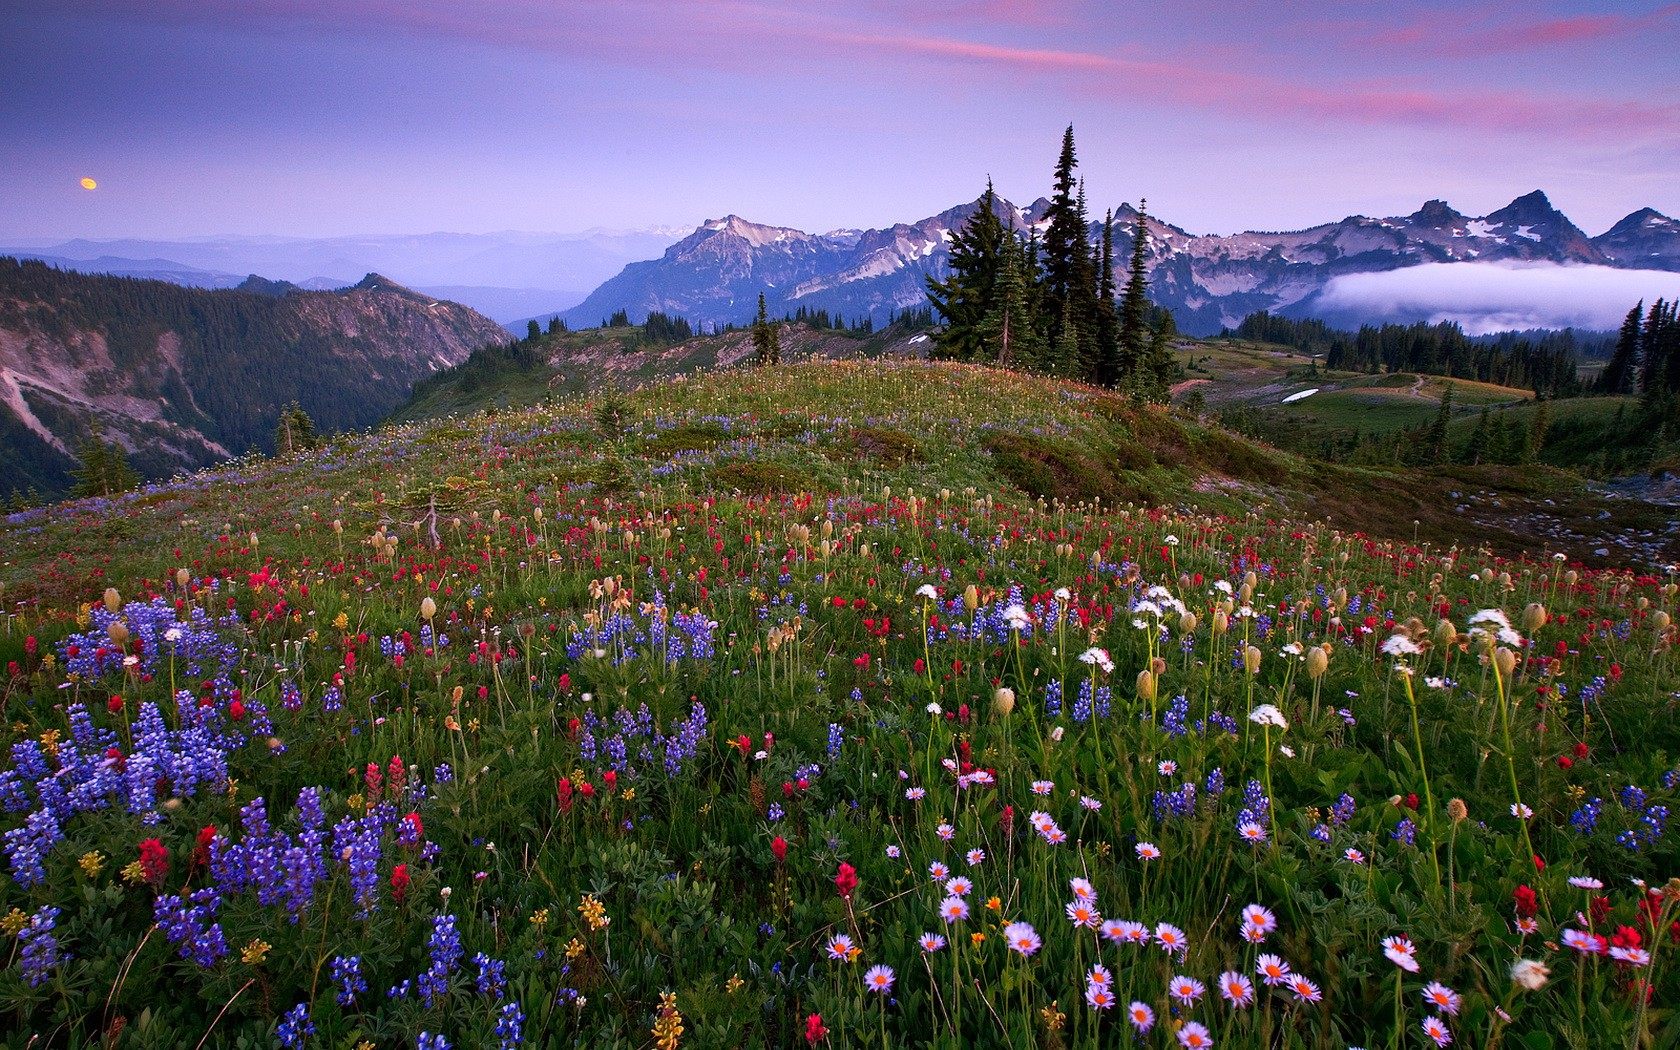 поляна цветы трава холмы горы glade flowers grass hills mountains  № 1829186 бесплатно